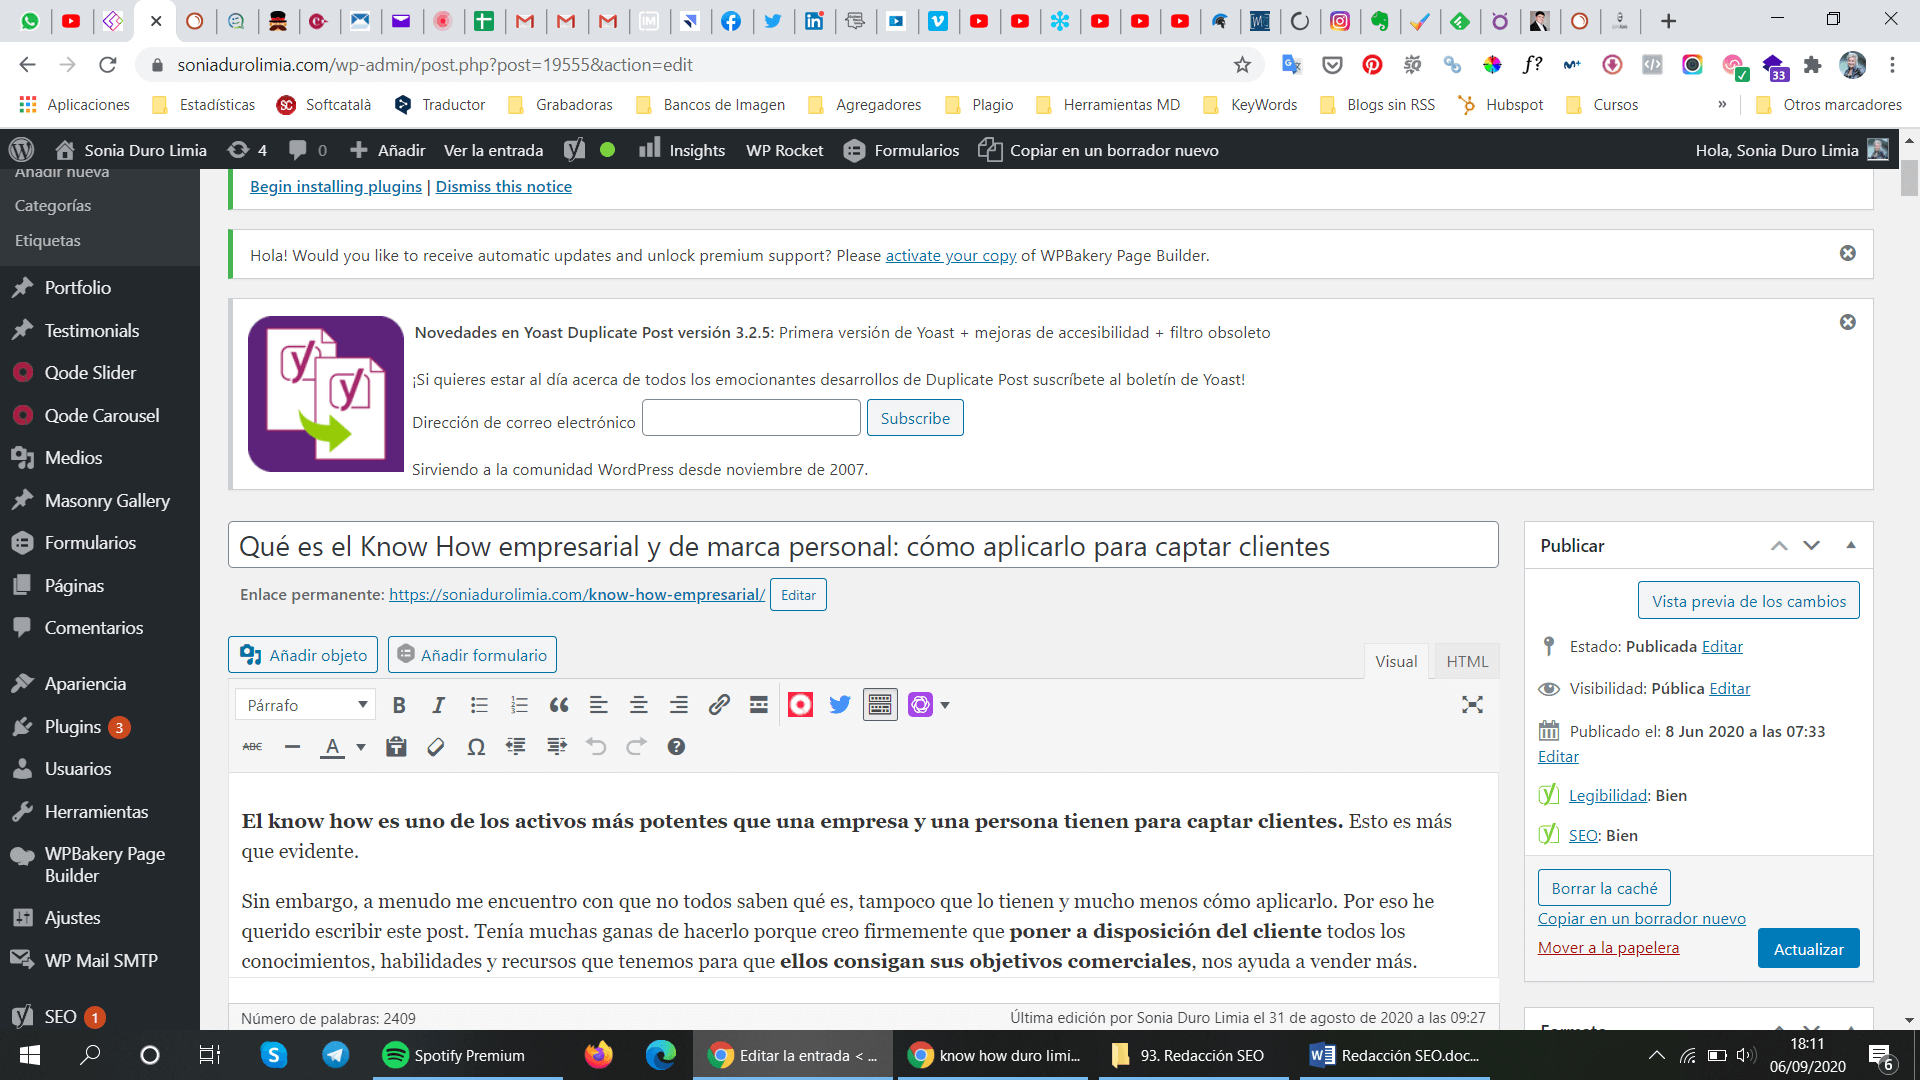 redaccion seo url amigable